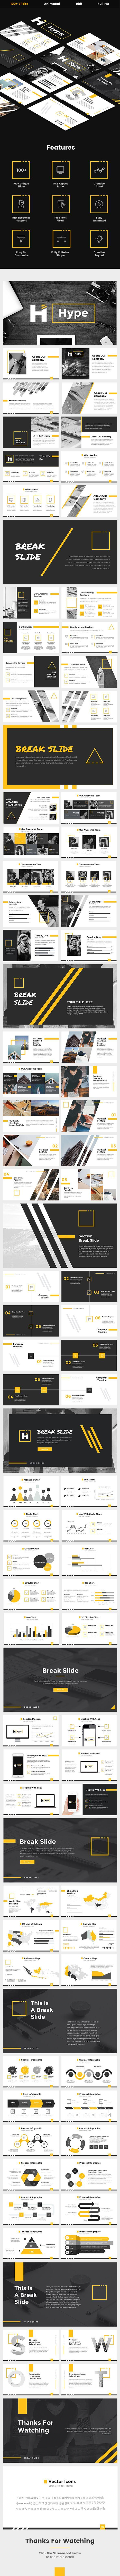 Hype - Creative Powerpoint Template - Creative PowerPoint Templates